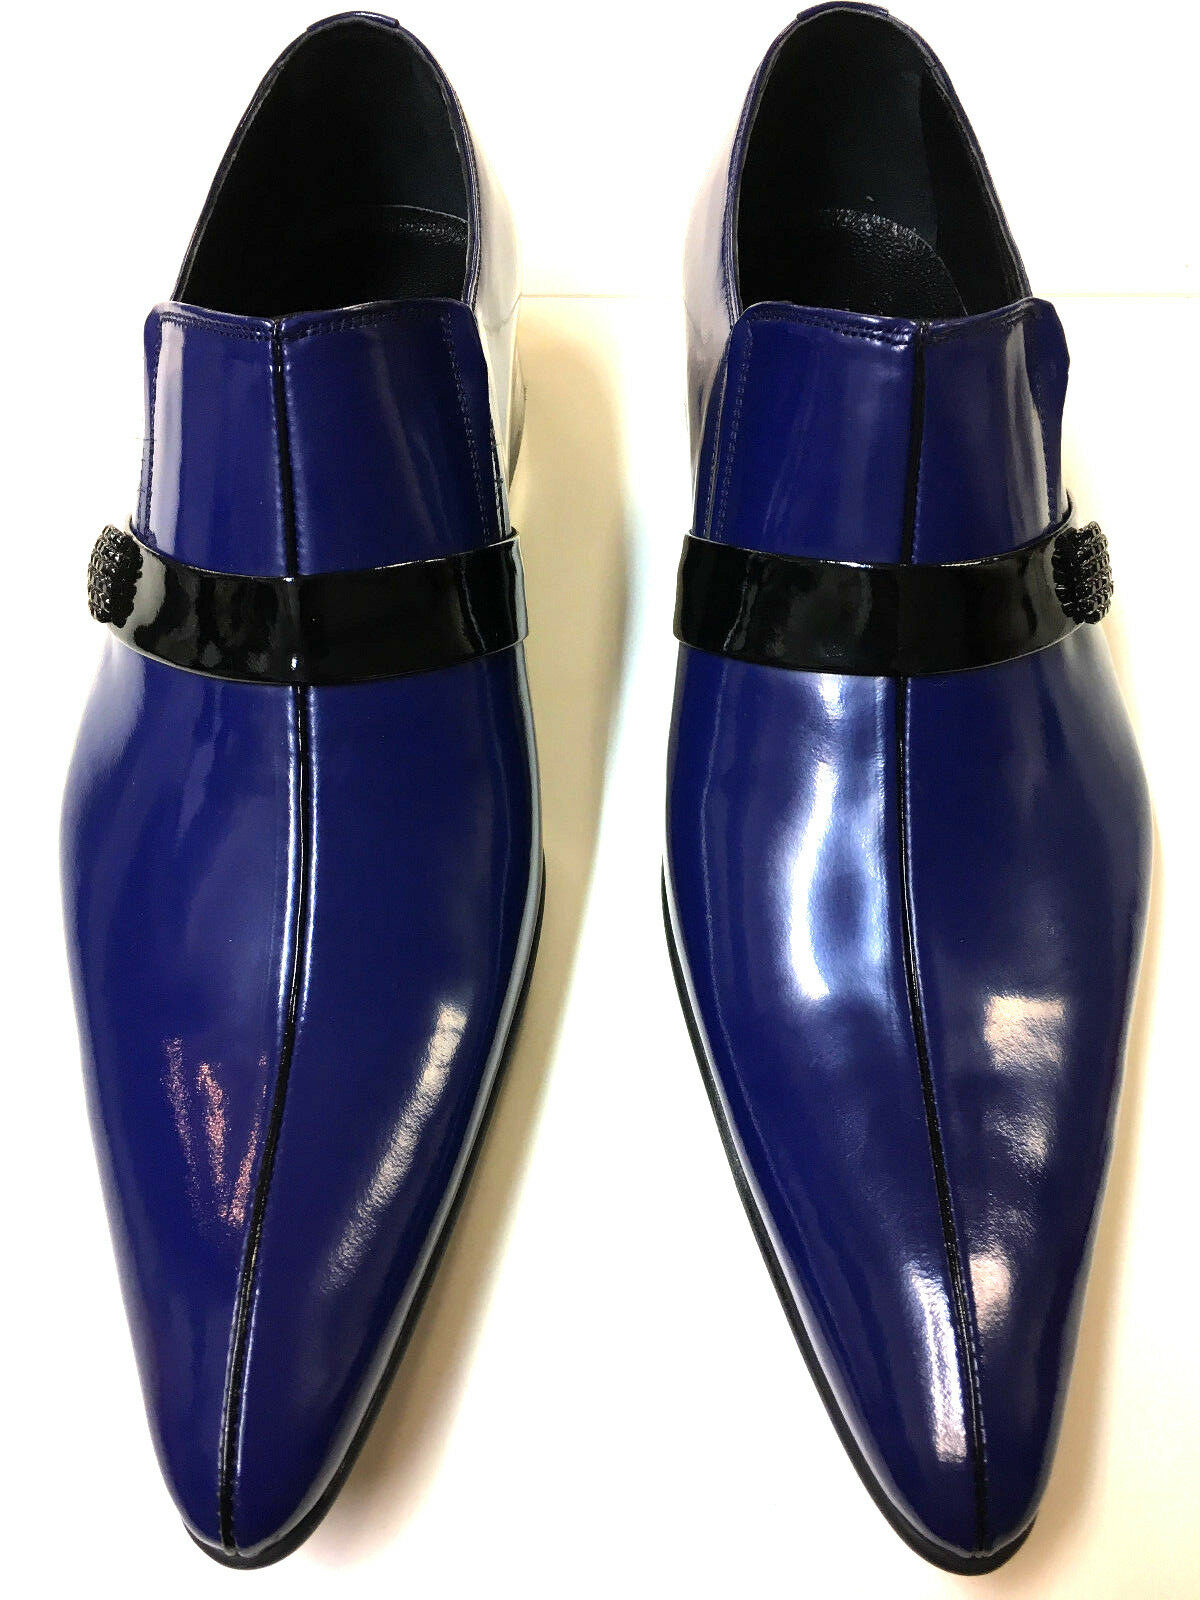 Chelsy excentrique Cuir Cuir excentrique Hommes Chaussure cuir slipper bleu cuir semelle pièce unique 44 71739b